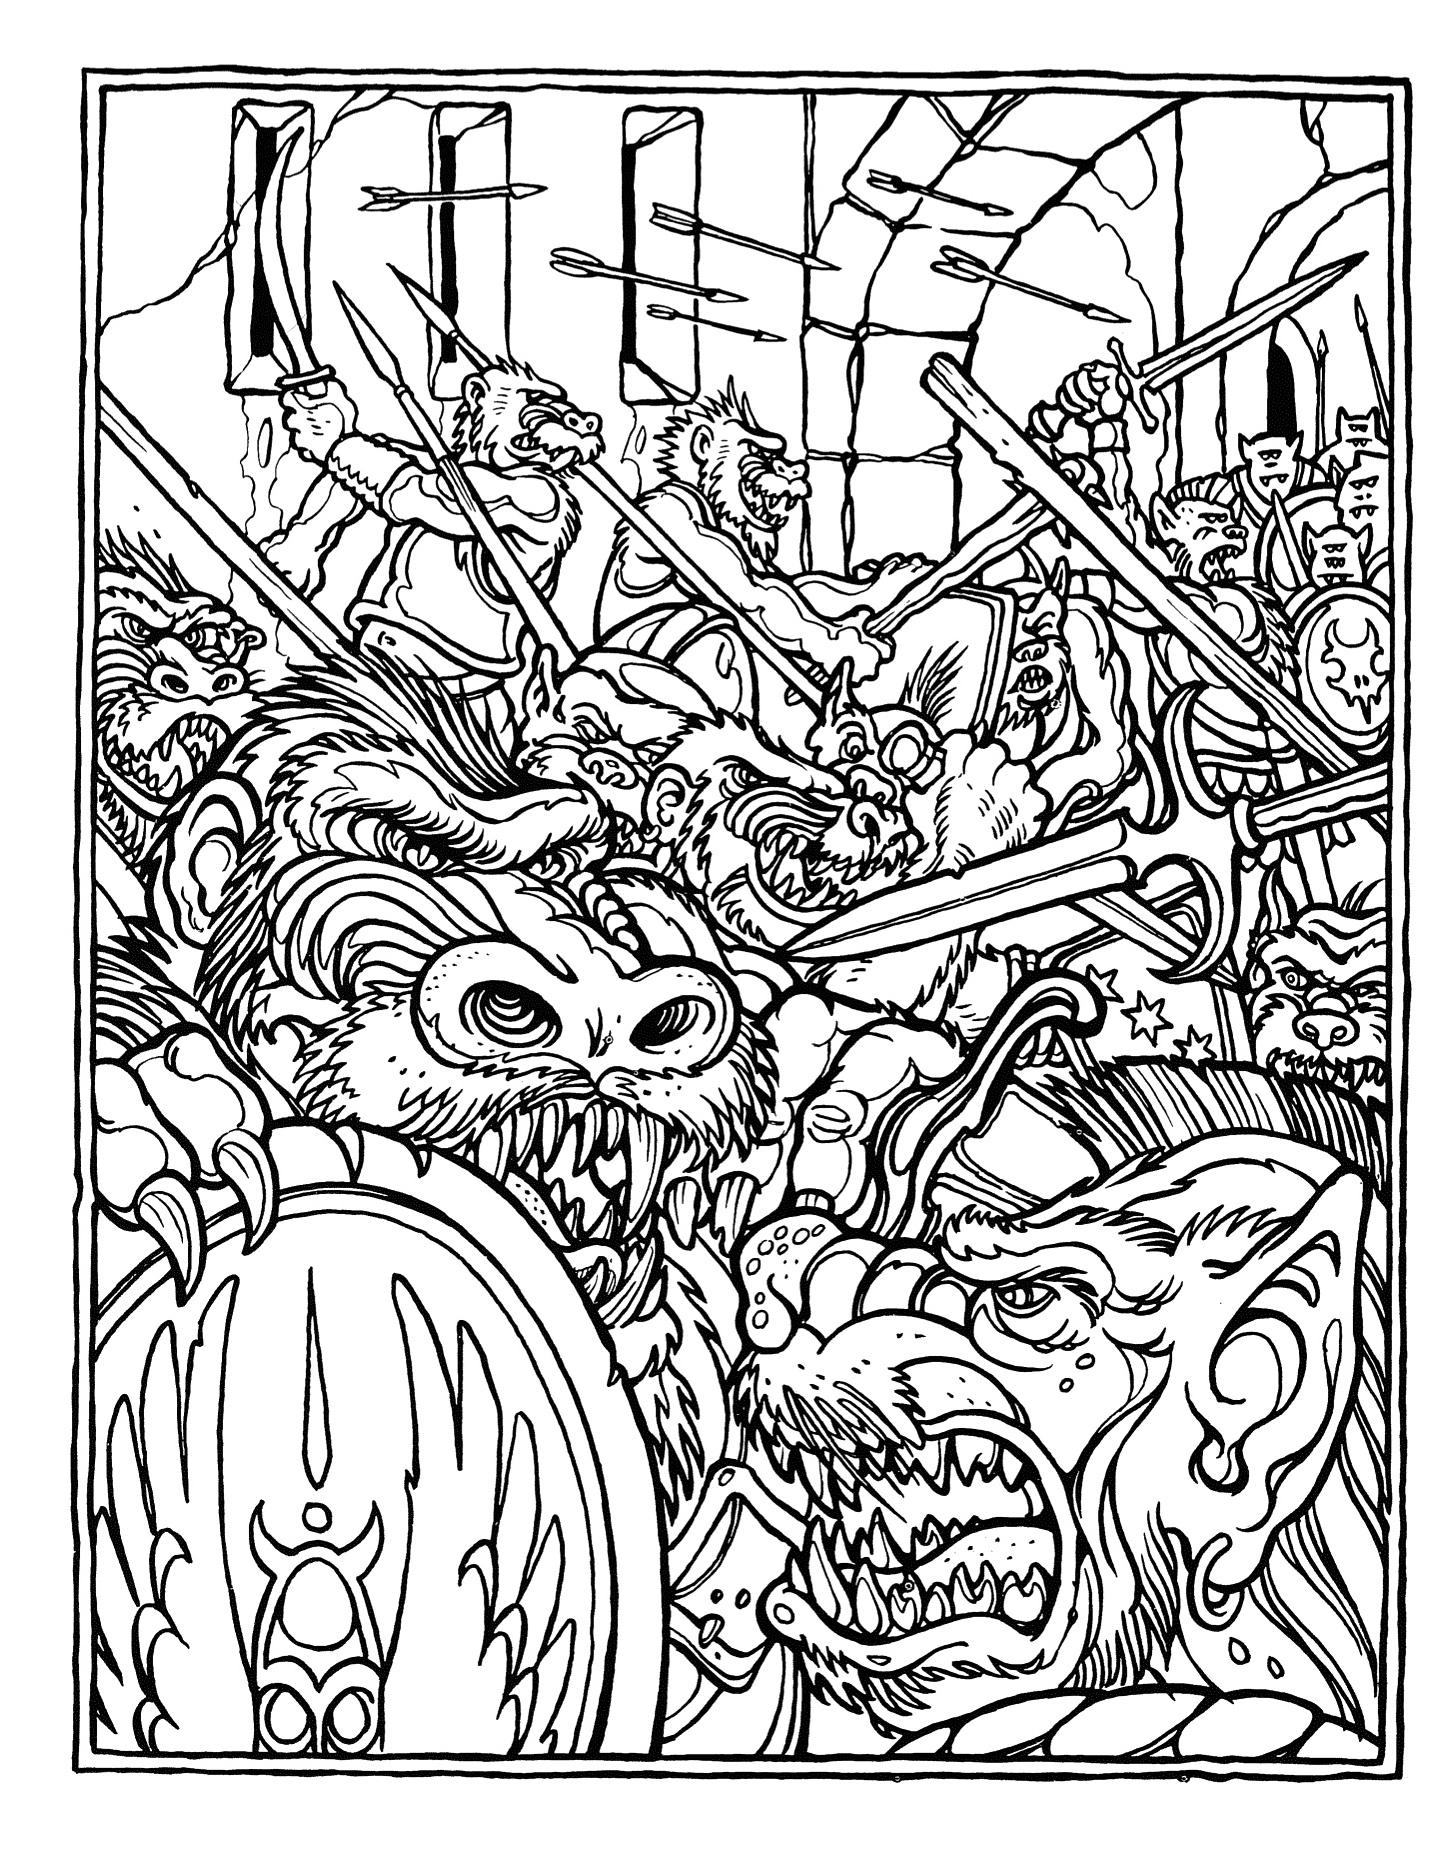 Battle coloring #1, Download drawings